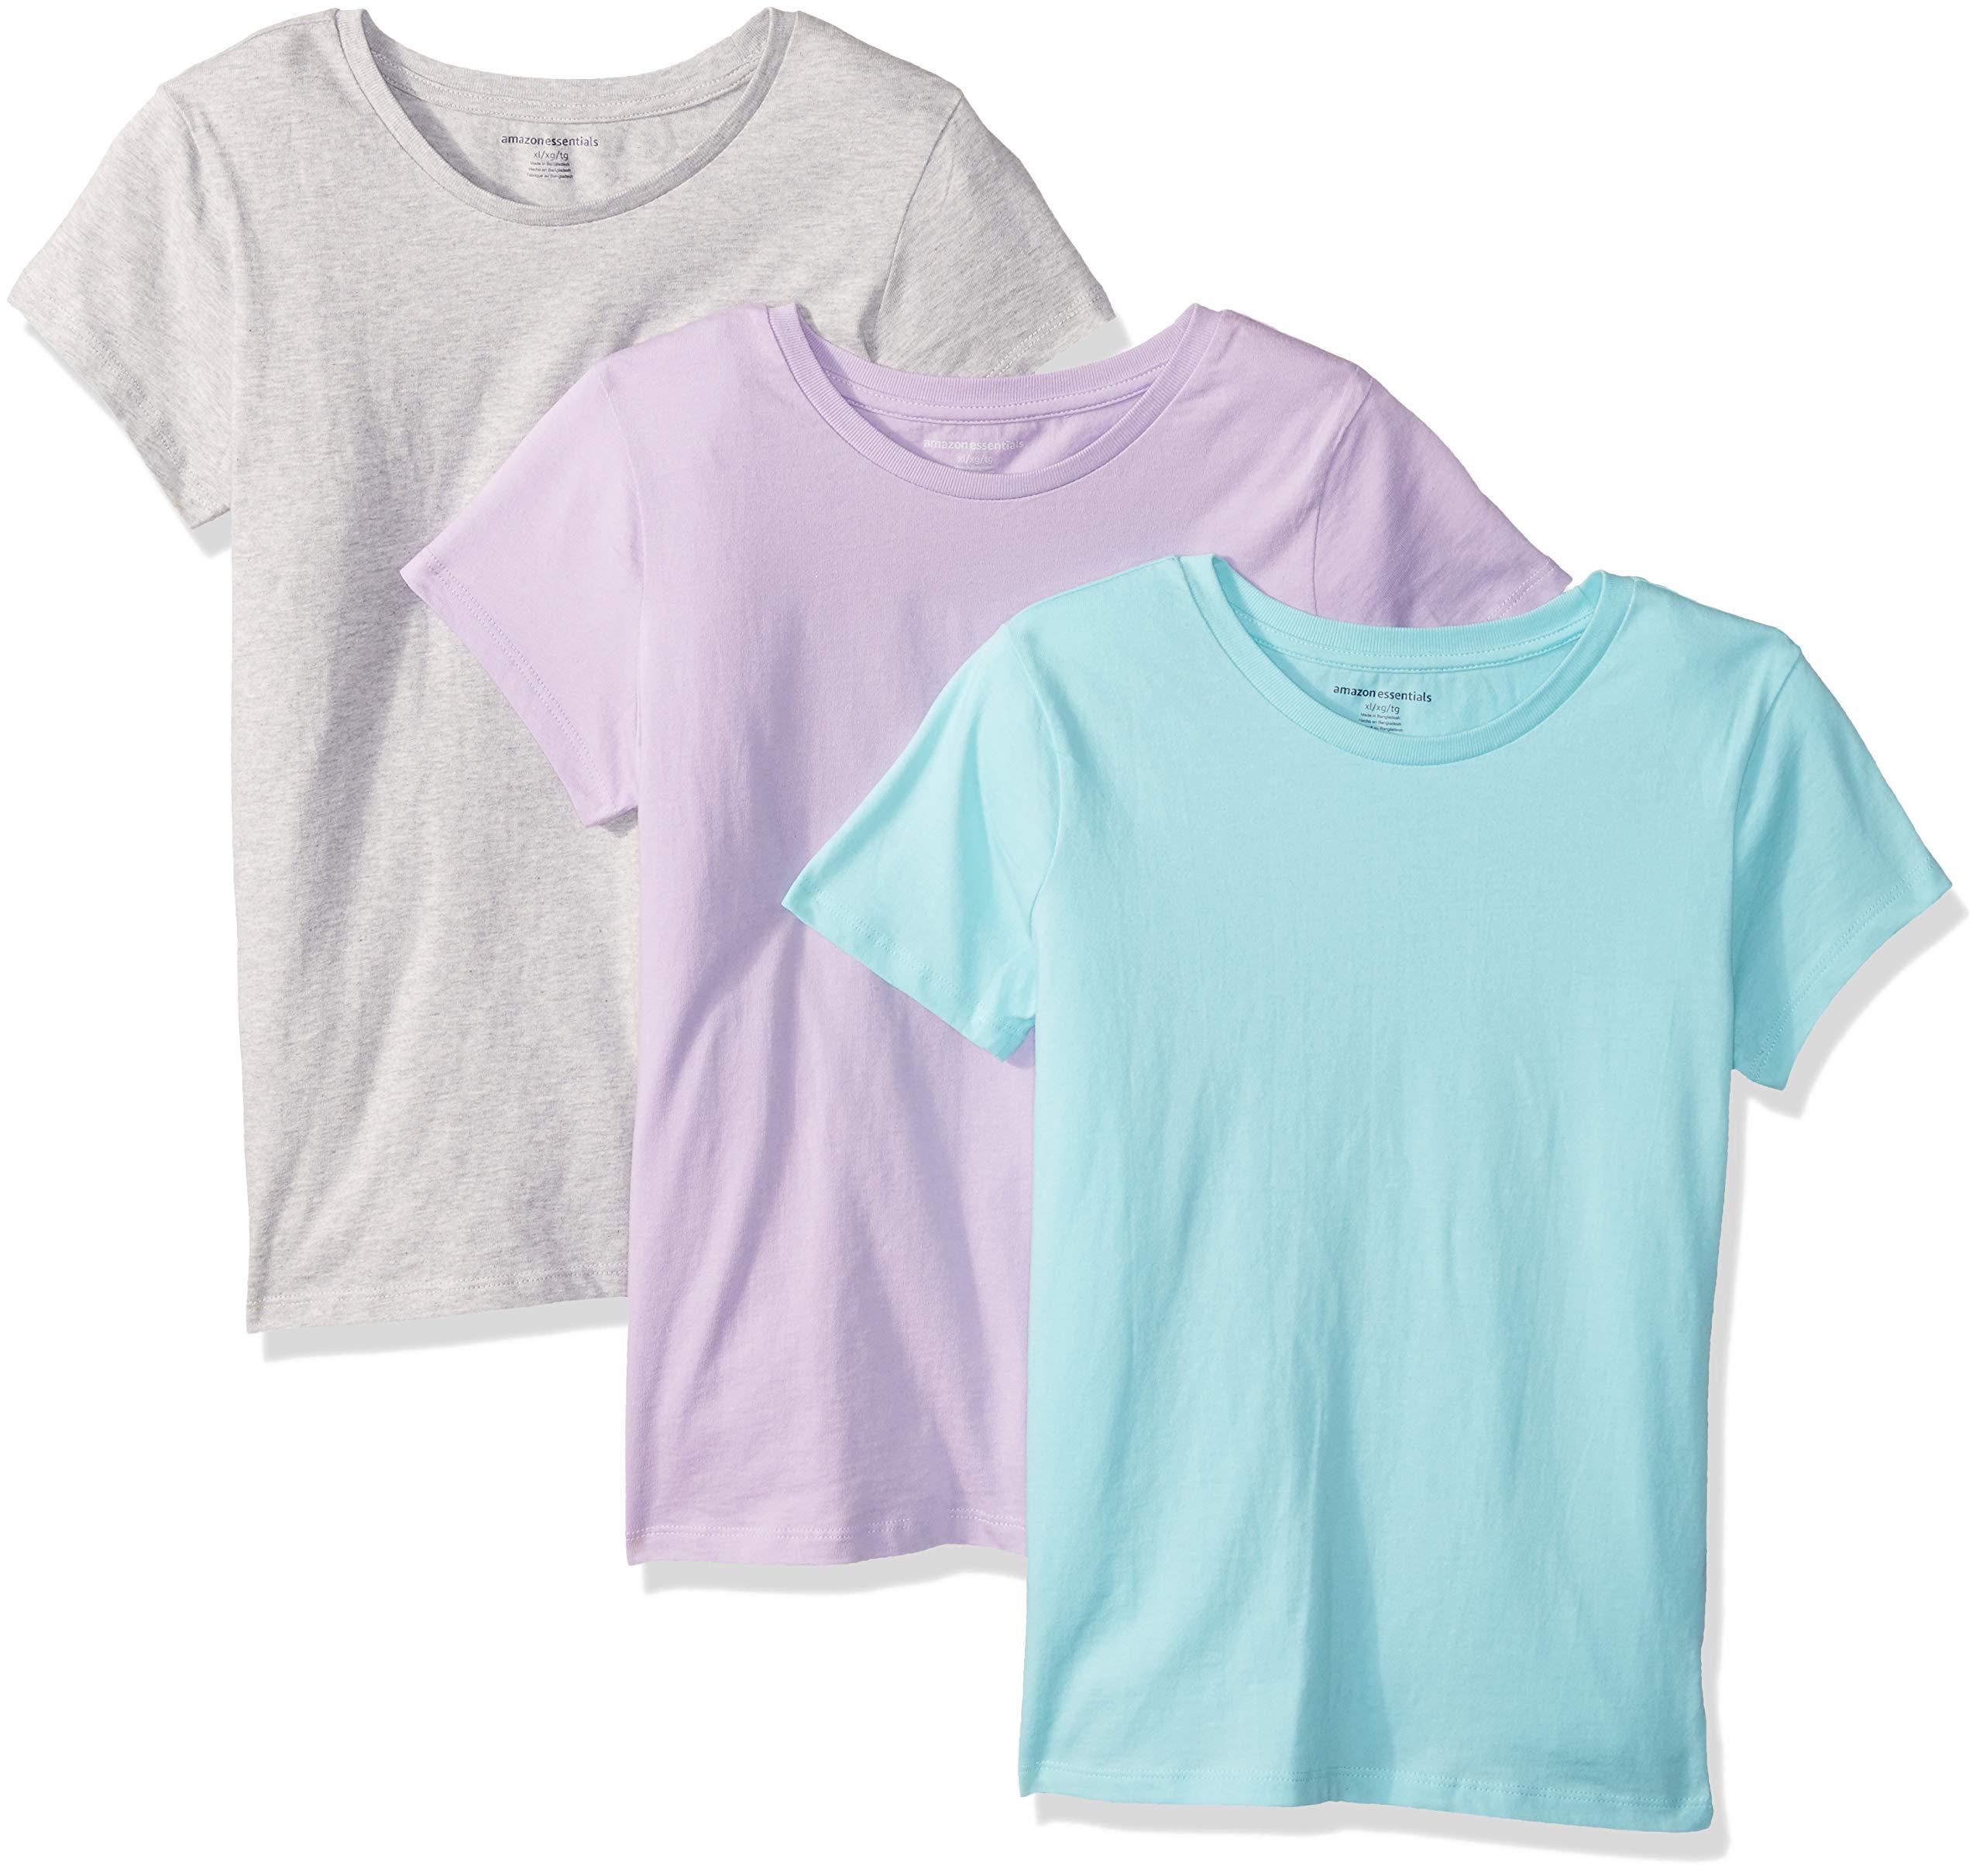 Amazon Essentials Girls' 3-Pack Short Sleeve T-Shirt